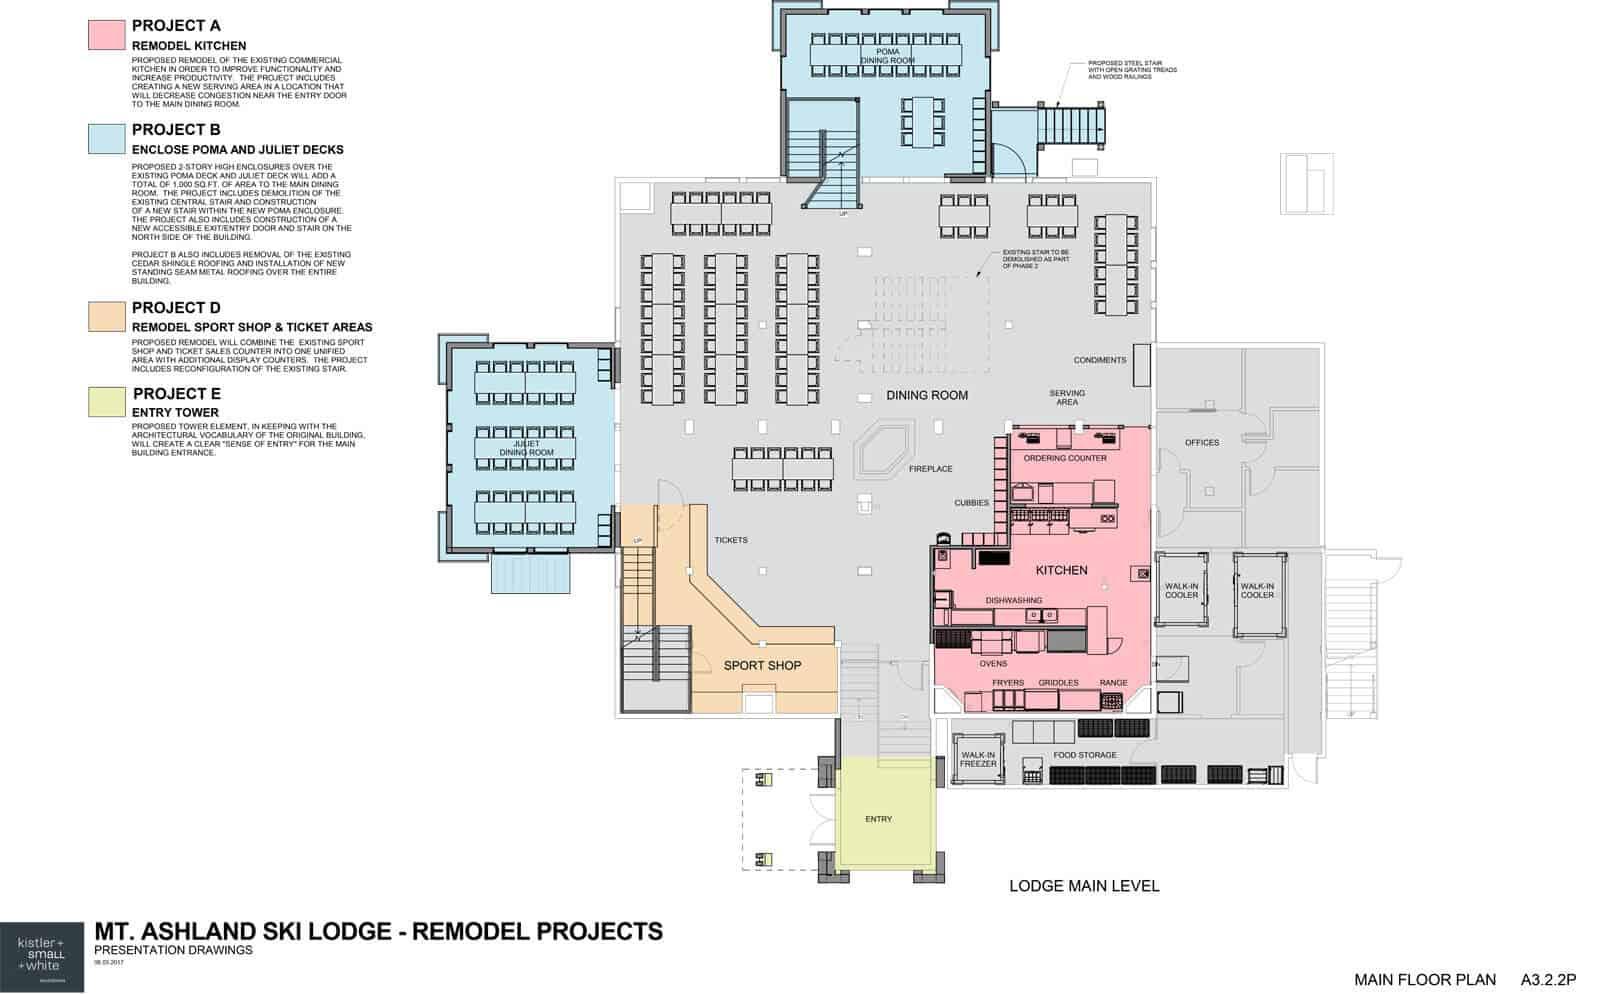 Proposed Lodge Main Floor Plan